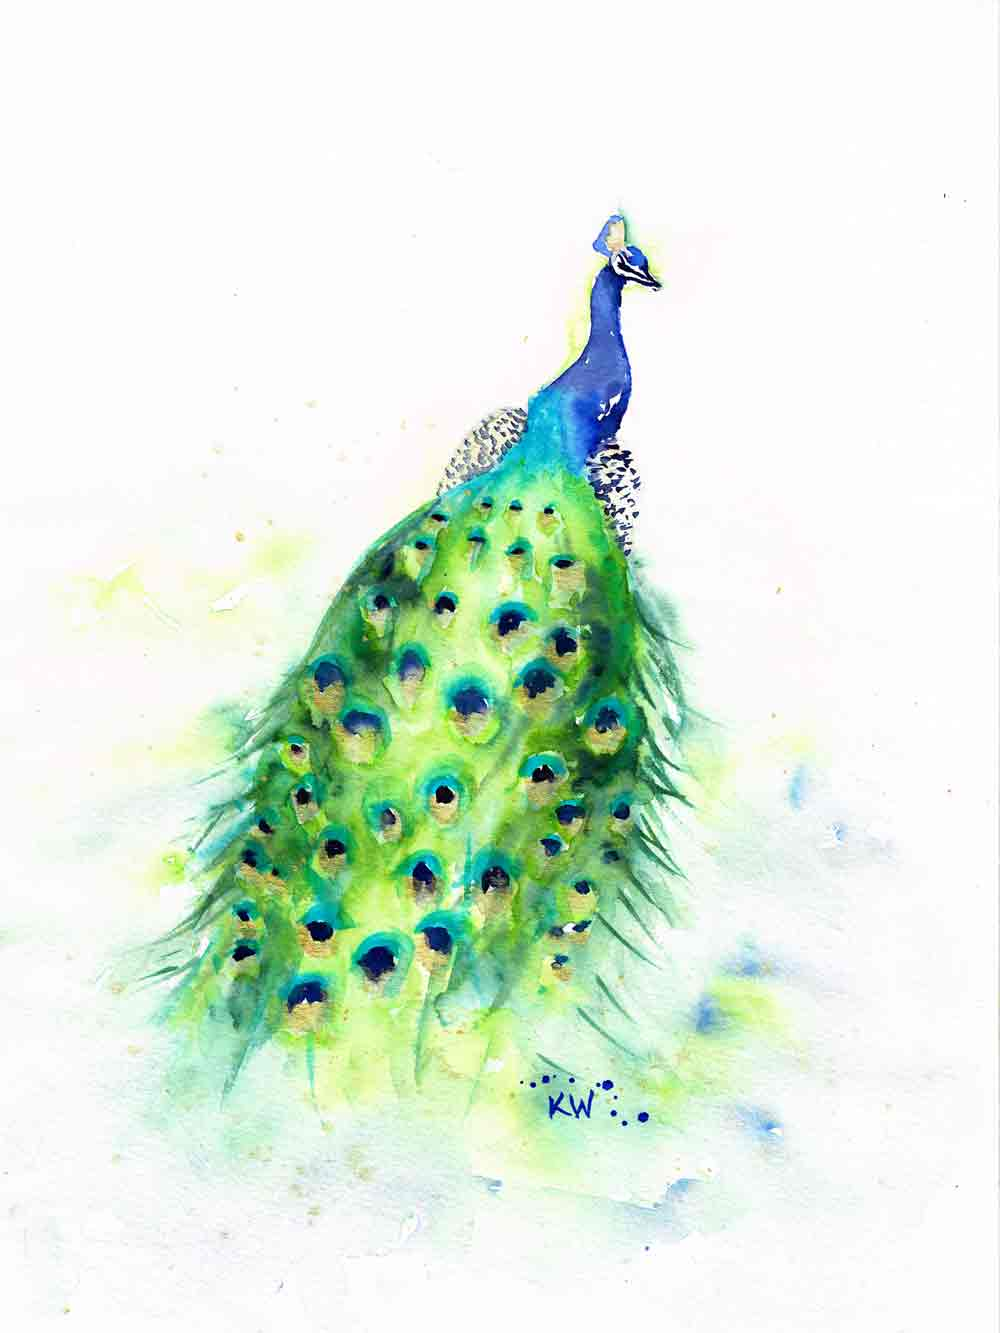 Dramatic-birds-no-6-peacock-tail-kw.jpg